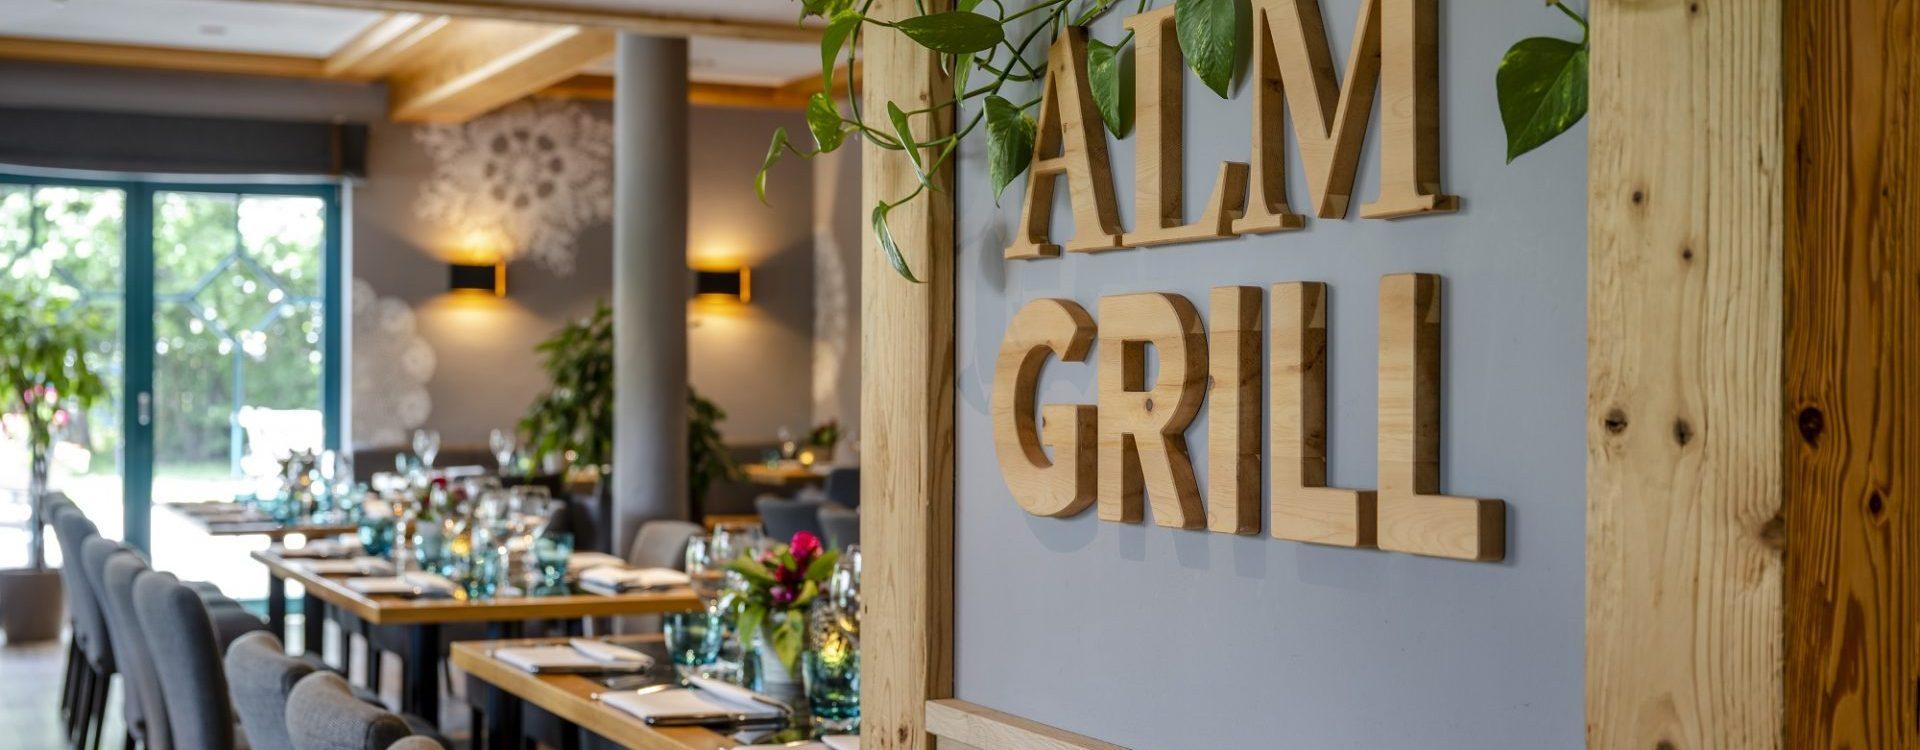 almgrill_steakhouse_hotel_erb_parsdorf_11